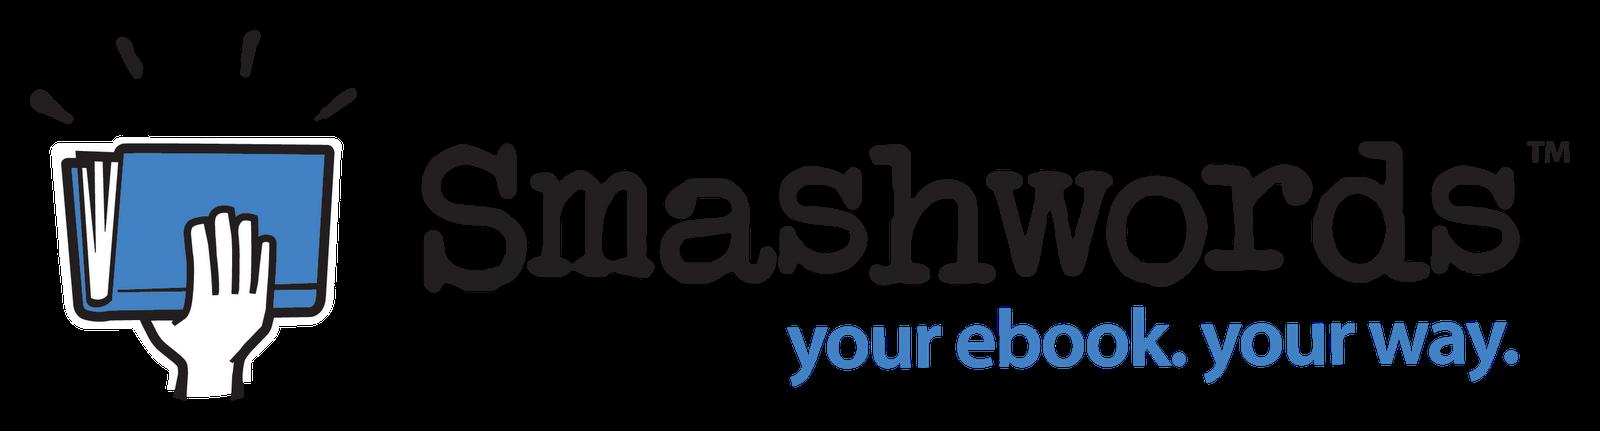 smashwords logo.png